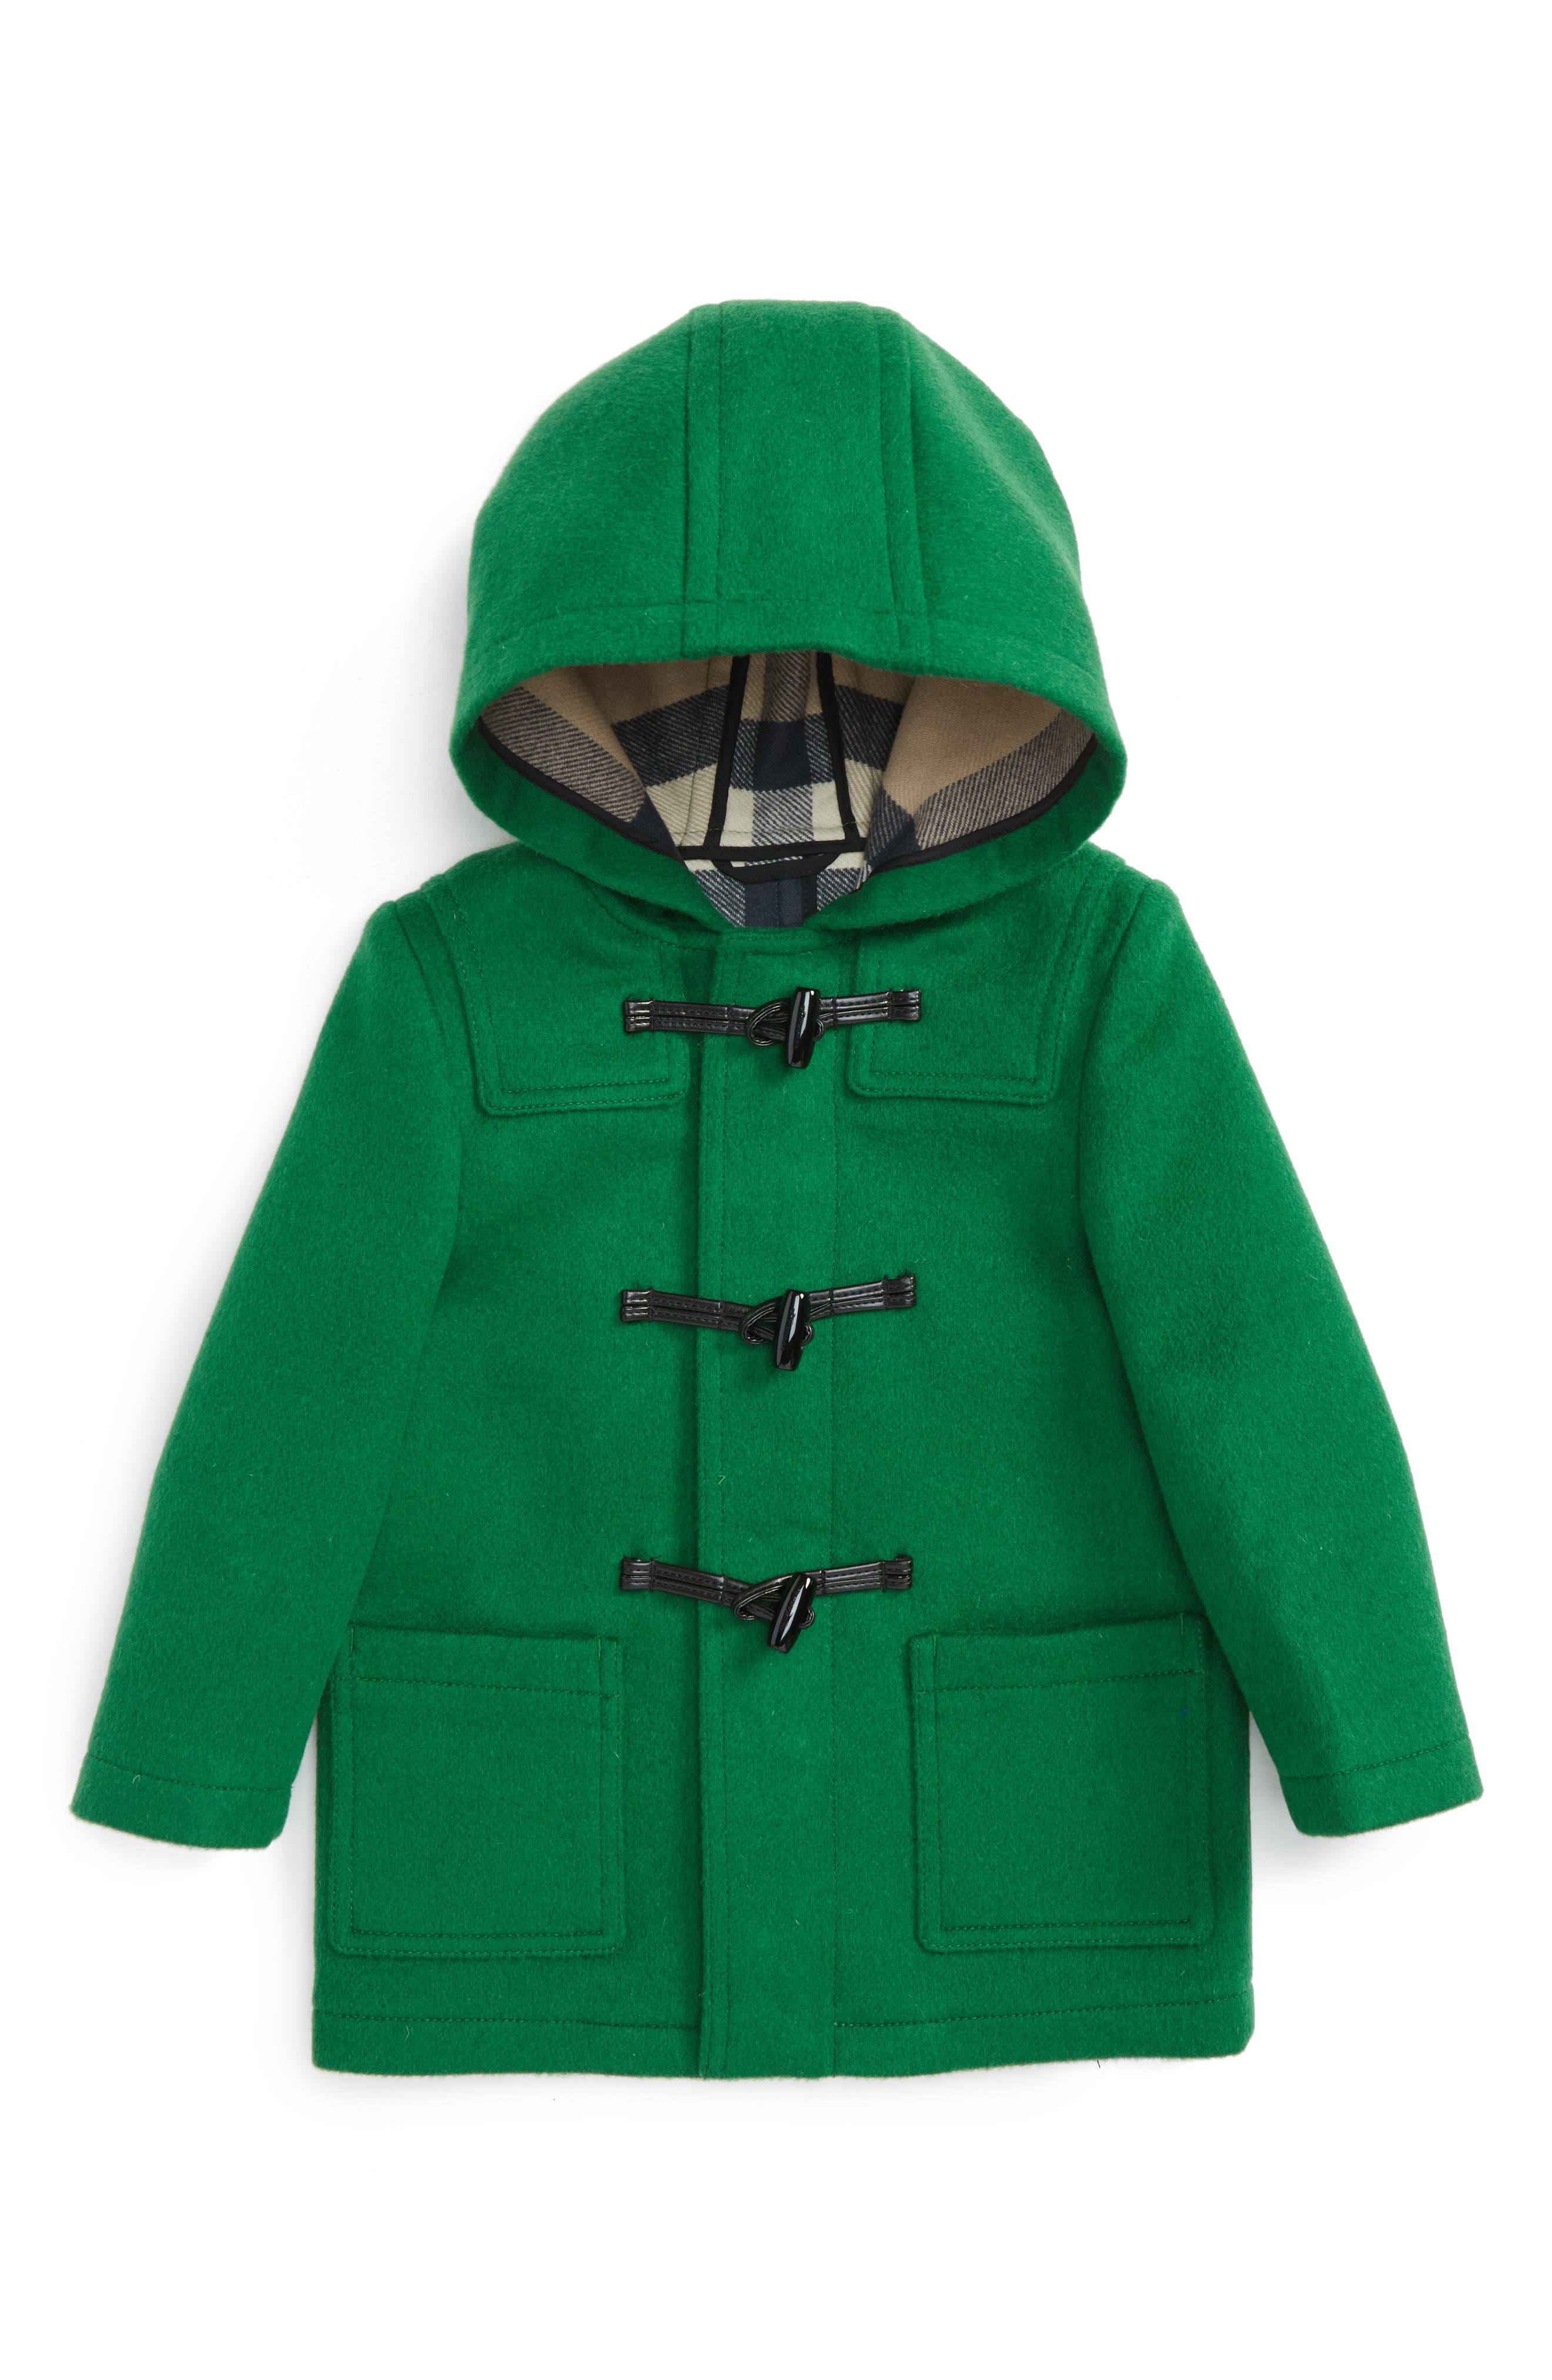 Brogan Hooded Wool Jacket,                             Main thumbnail 1, color,                             319